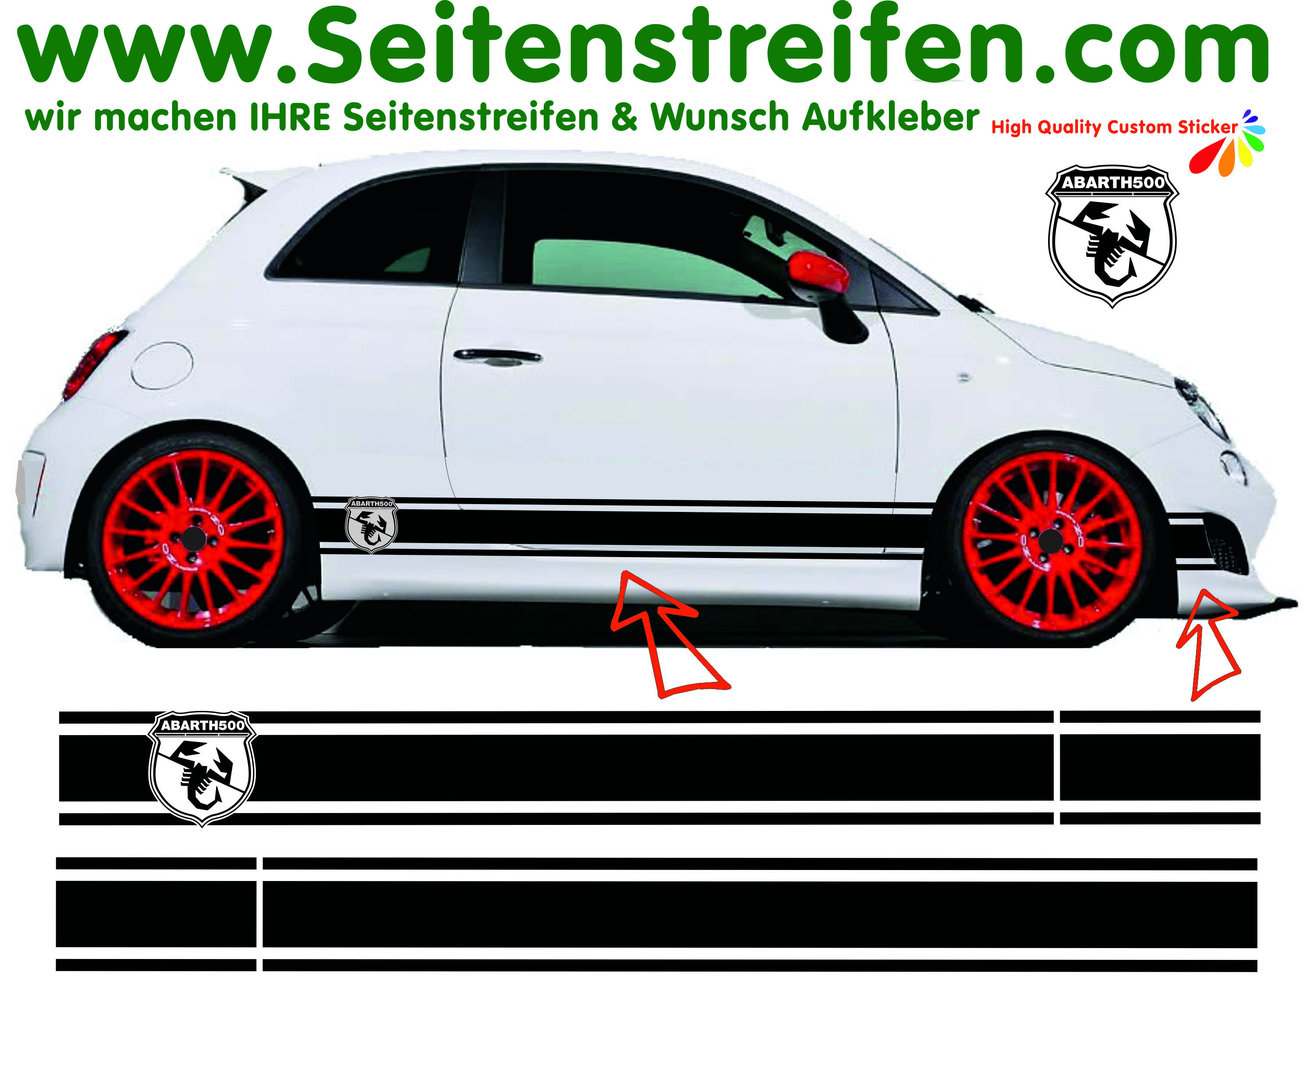 Fiat 500 Abarth Logo Xl Side Stripes Graphics Decals Sticker Kit N 1148